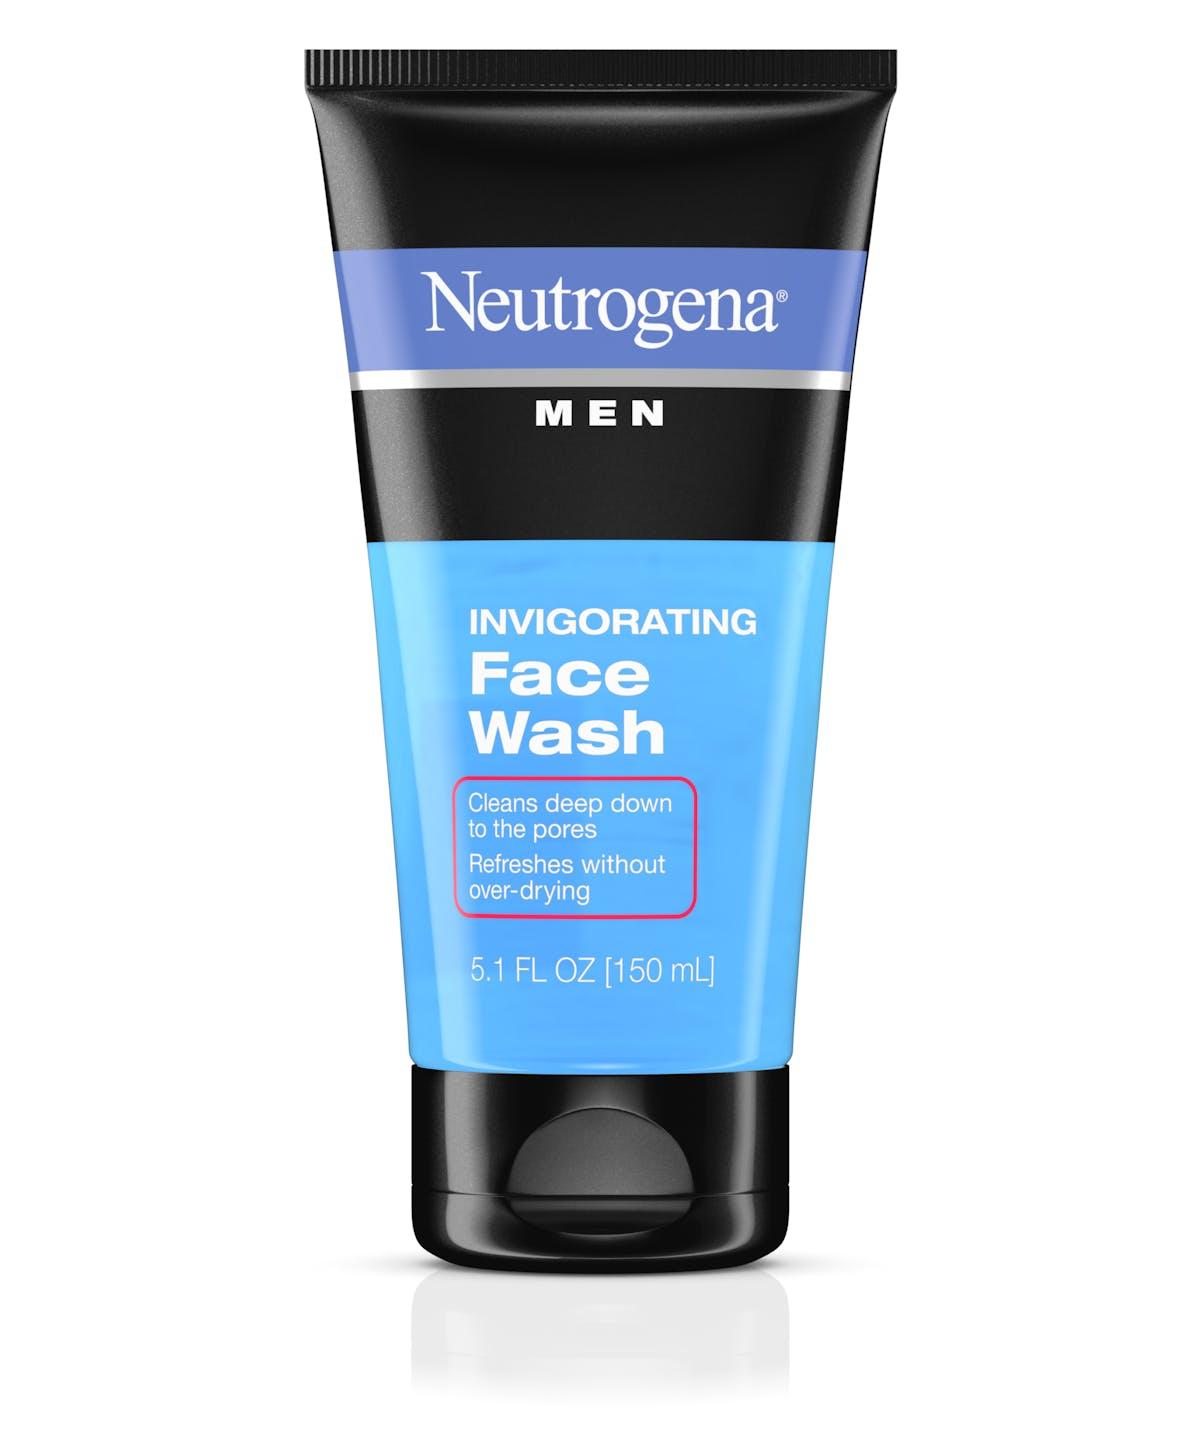 Men Invigorating Face Wash Neutrogena 174